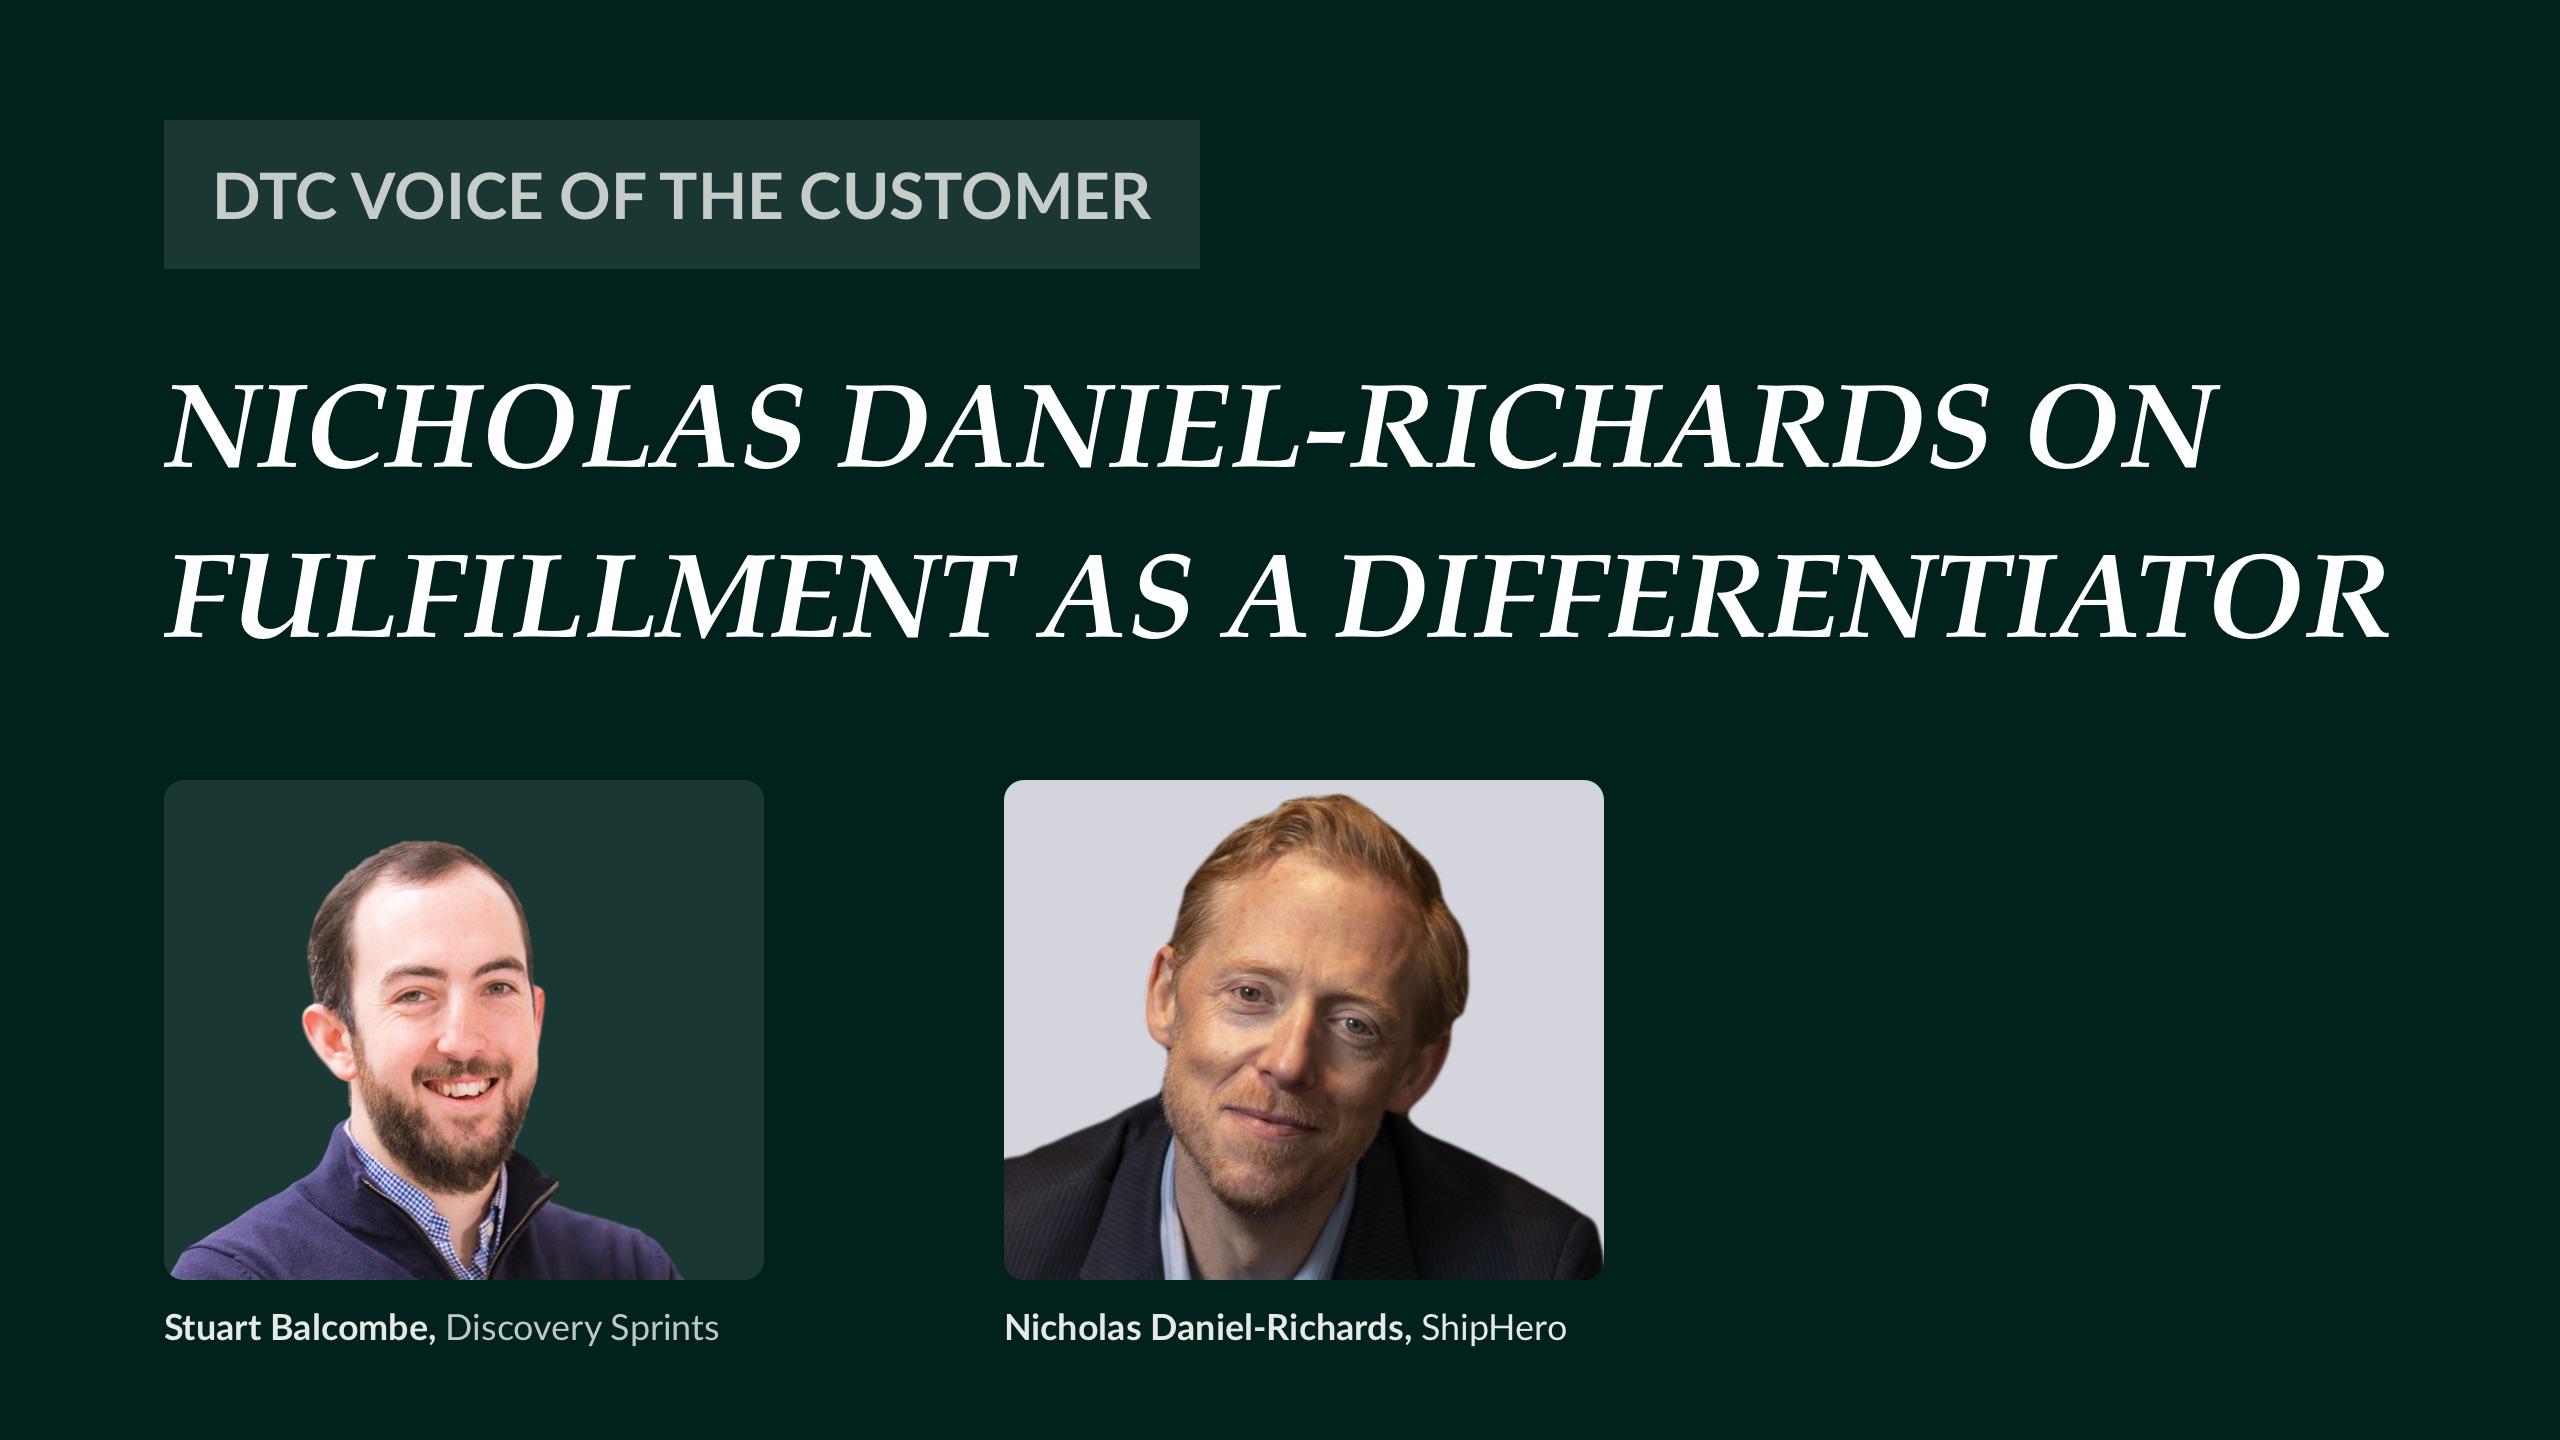 Nicholas Daniel-Richards on fulfillment as a CX differentiator